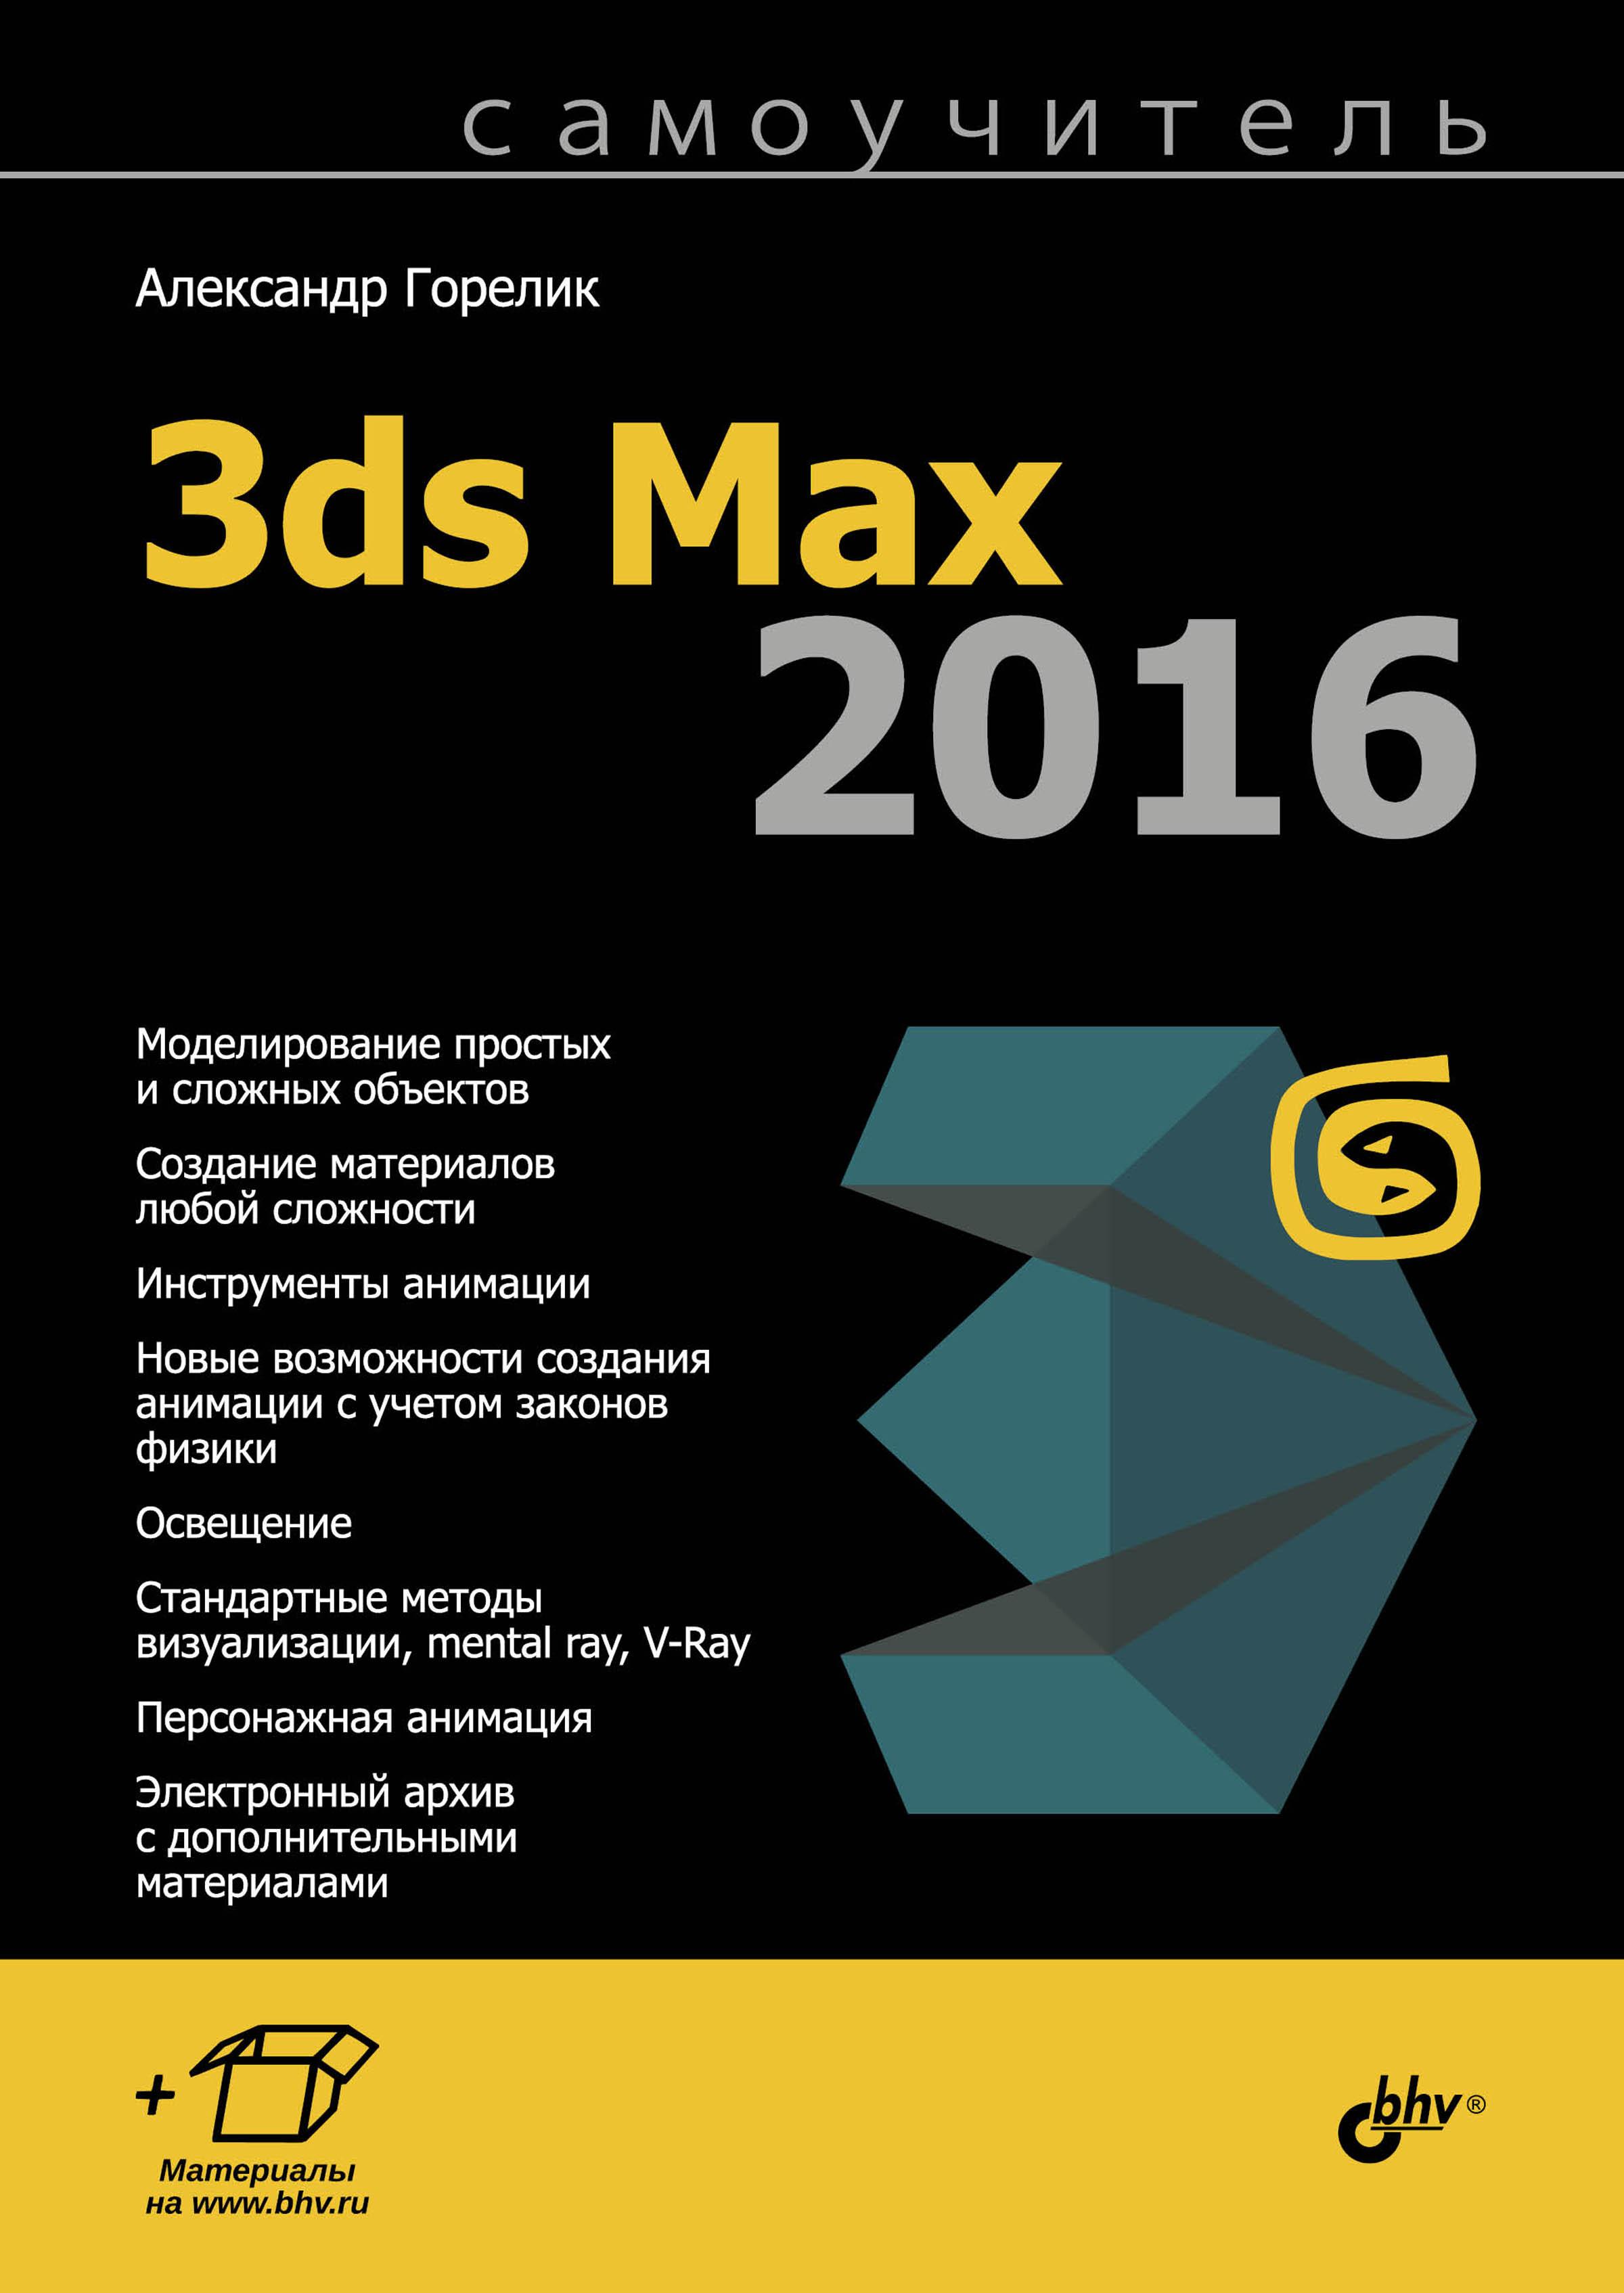 Александр Горелик Самоучитель 3ds Max 2016 м м соловьев 3ds max 9 самоучитель